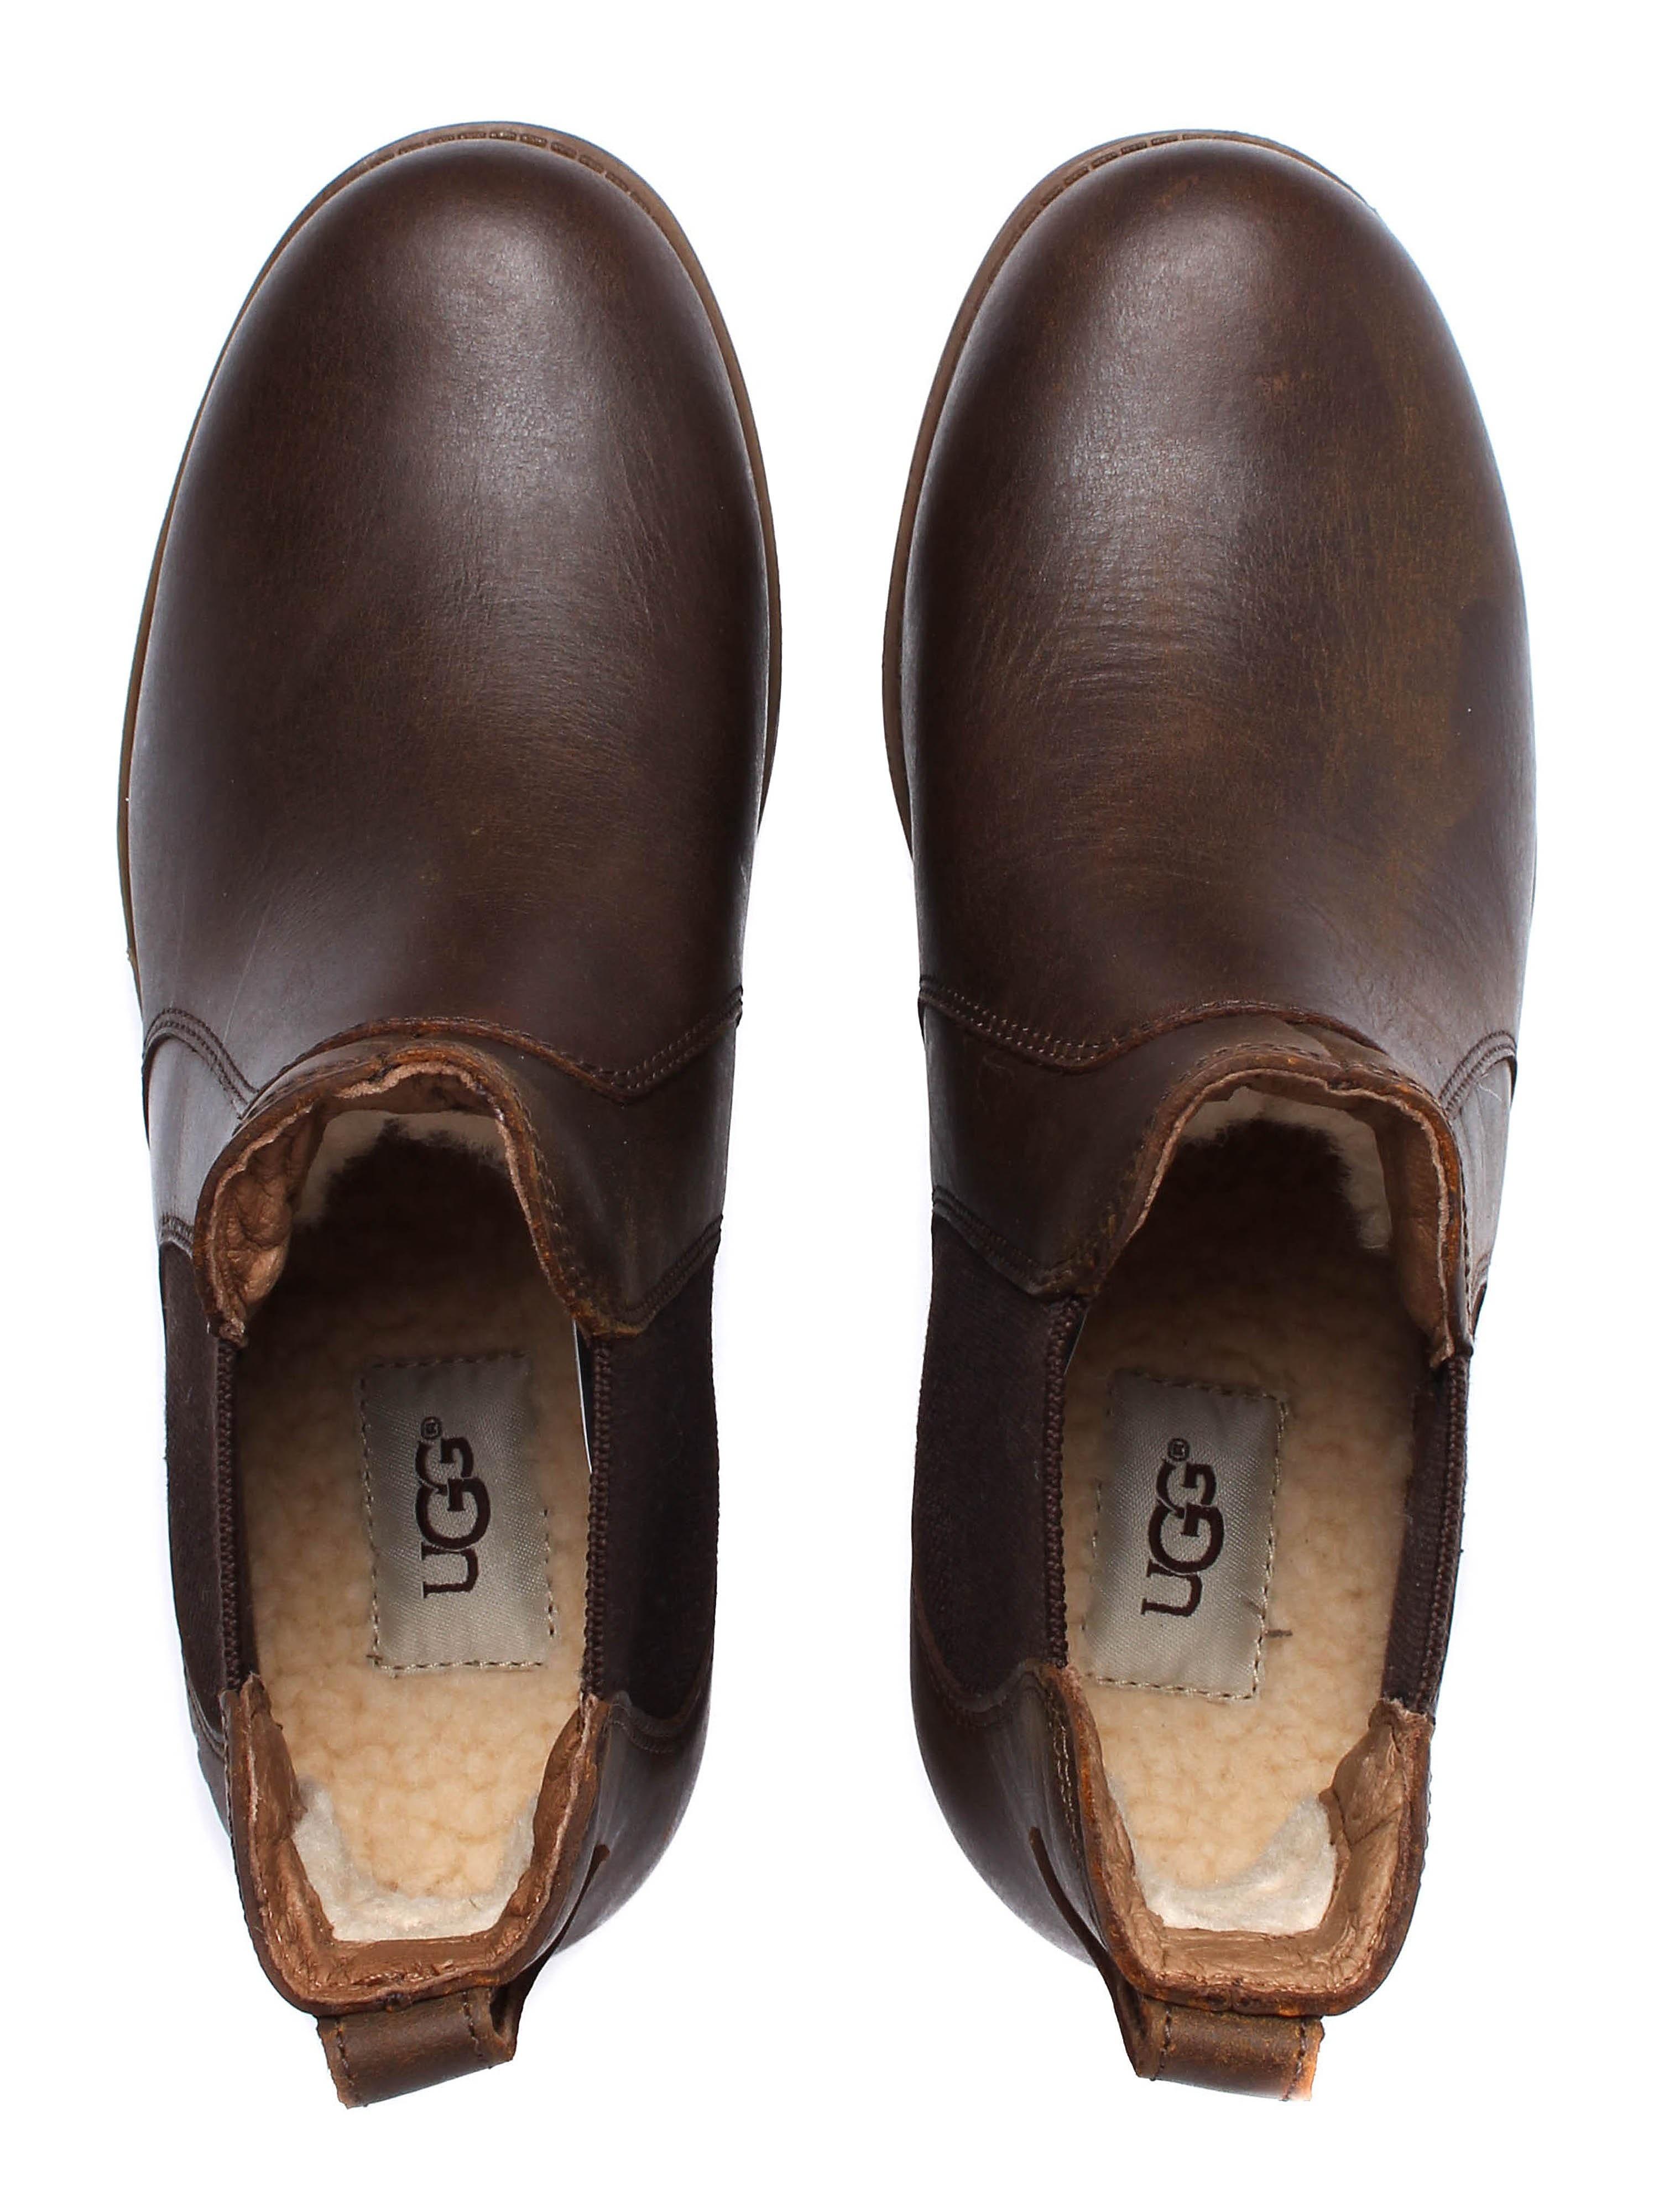 UGG Women's Bonham Boots - Stout Leather